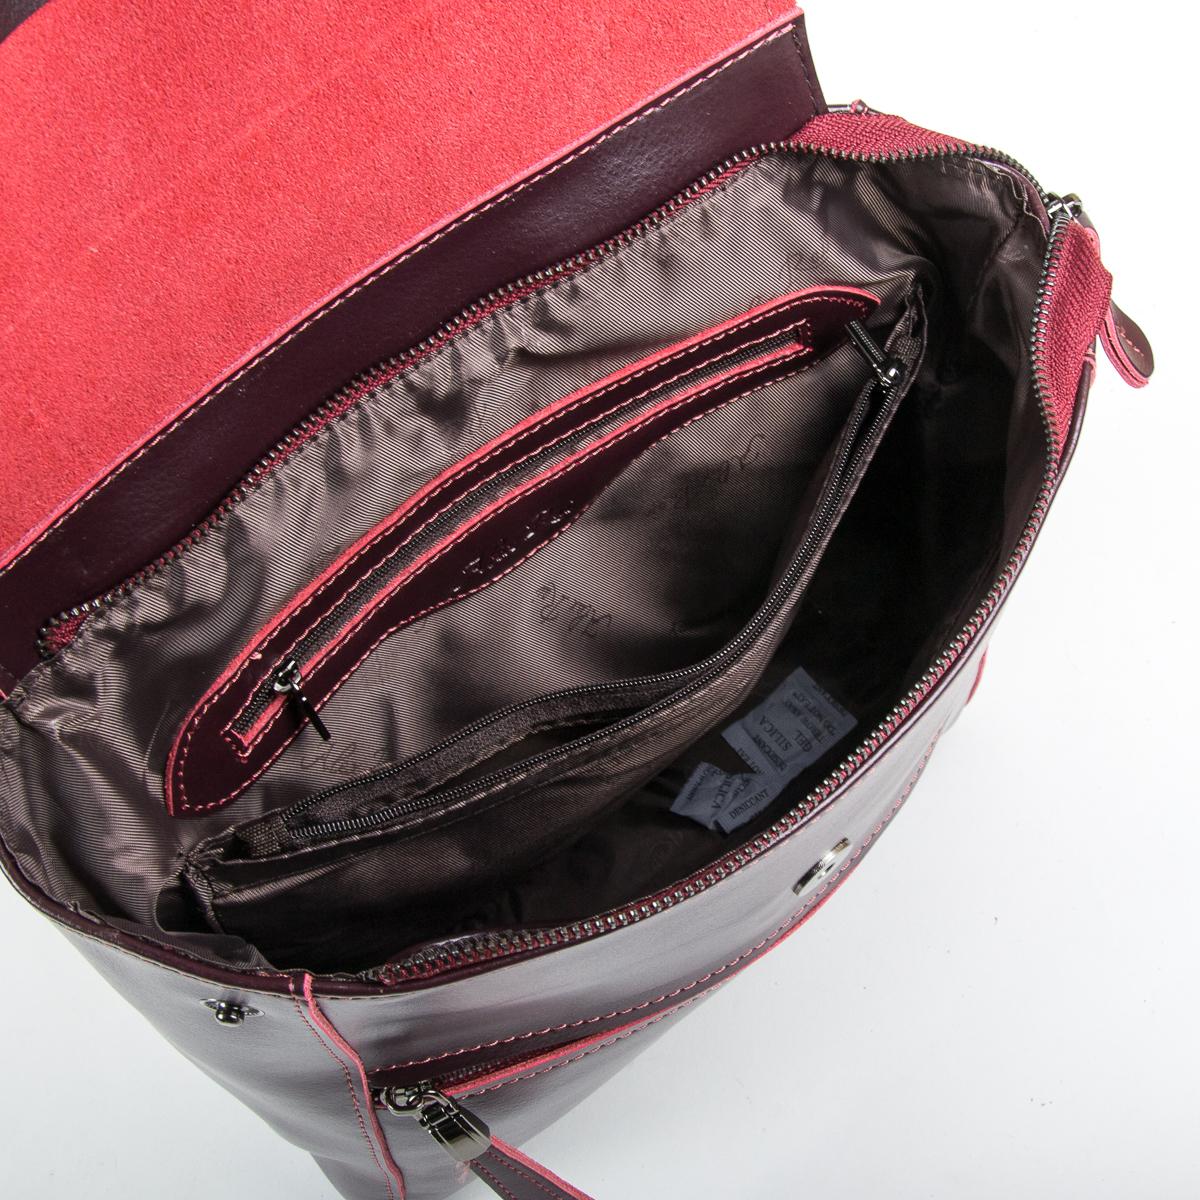 Сумка Женская Рюкзак кожа ALEX RAI 9-01 1005 clared - фото 5